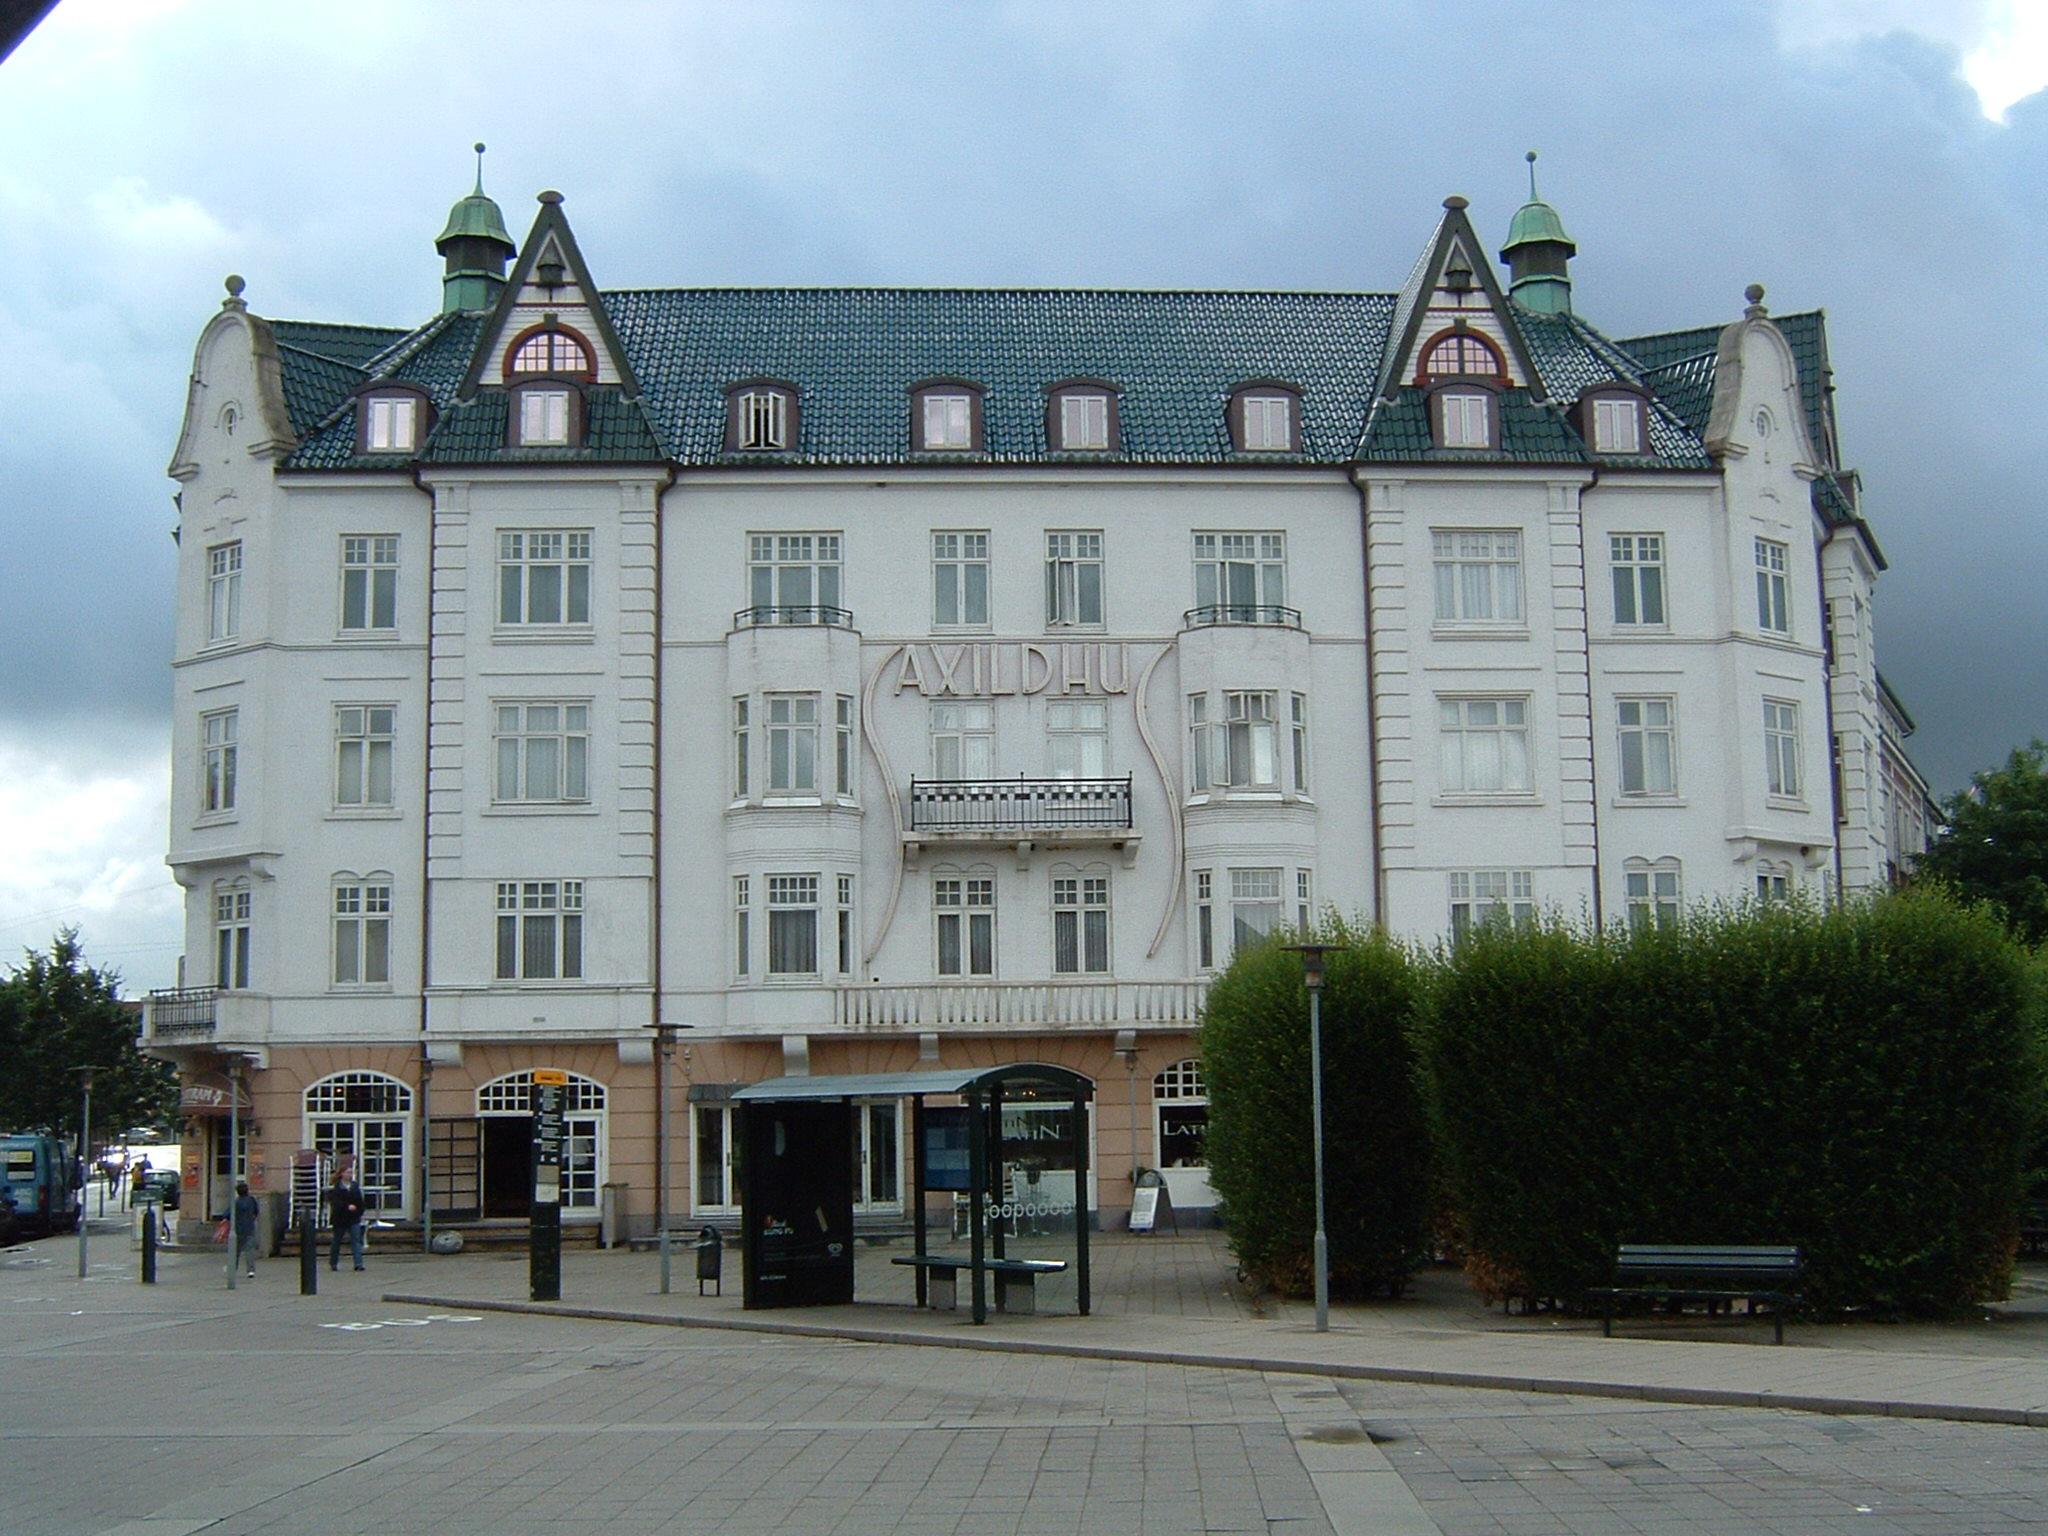 Danish Inns, Hotels & Manors